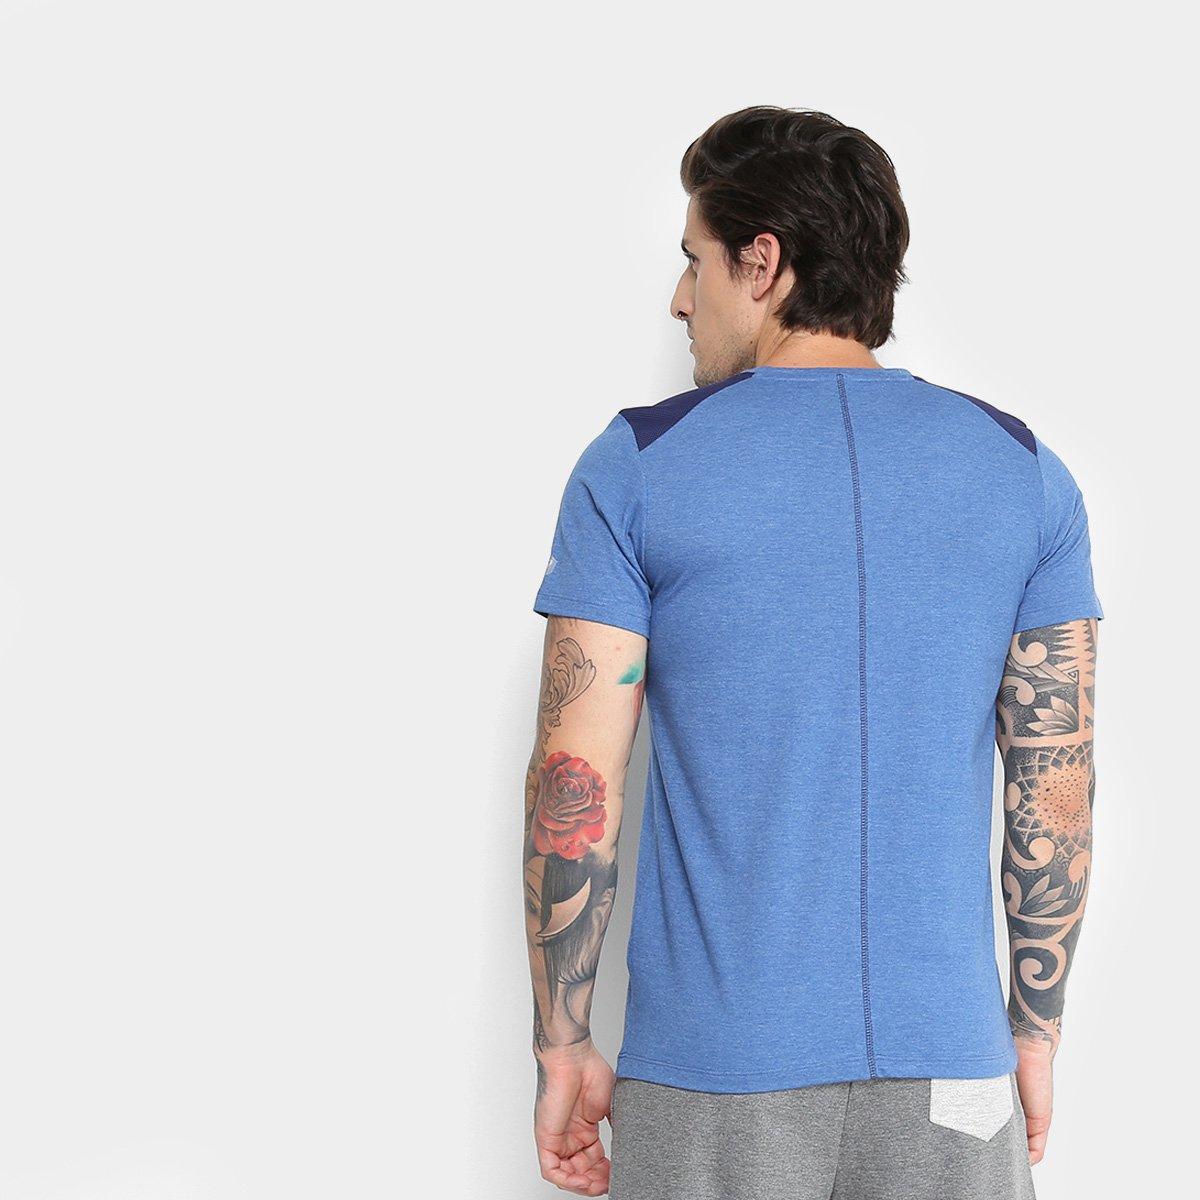 Camiseta Asics Workout Spiral SS Masculina - 1